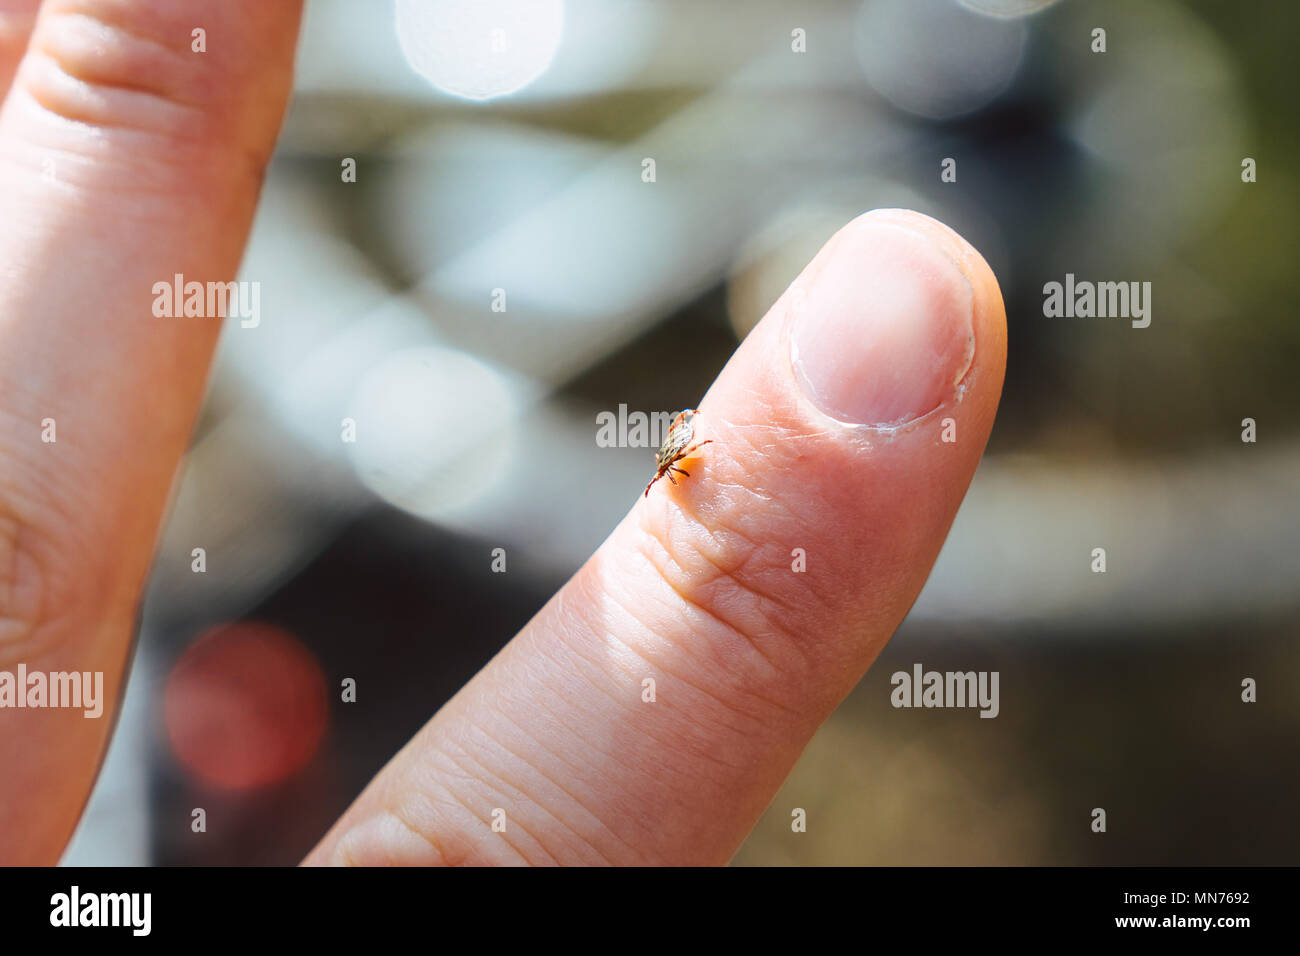 tick crawling on human finger - Stock Image